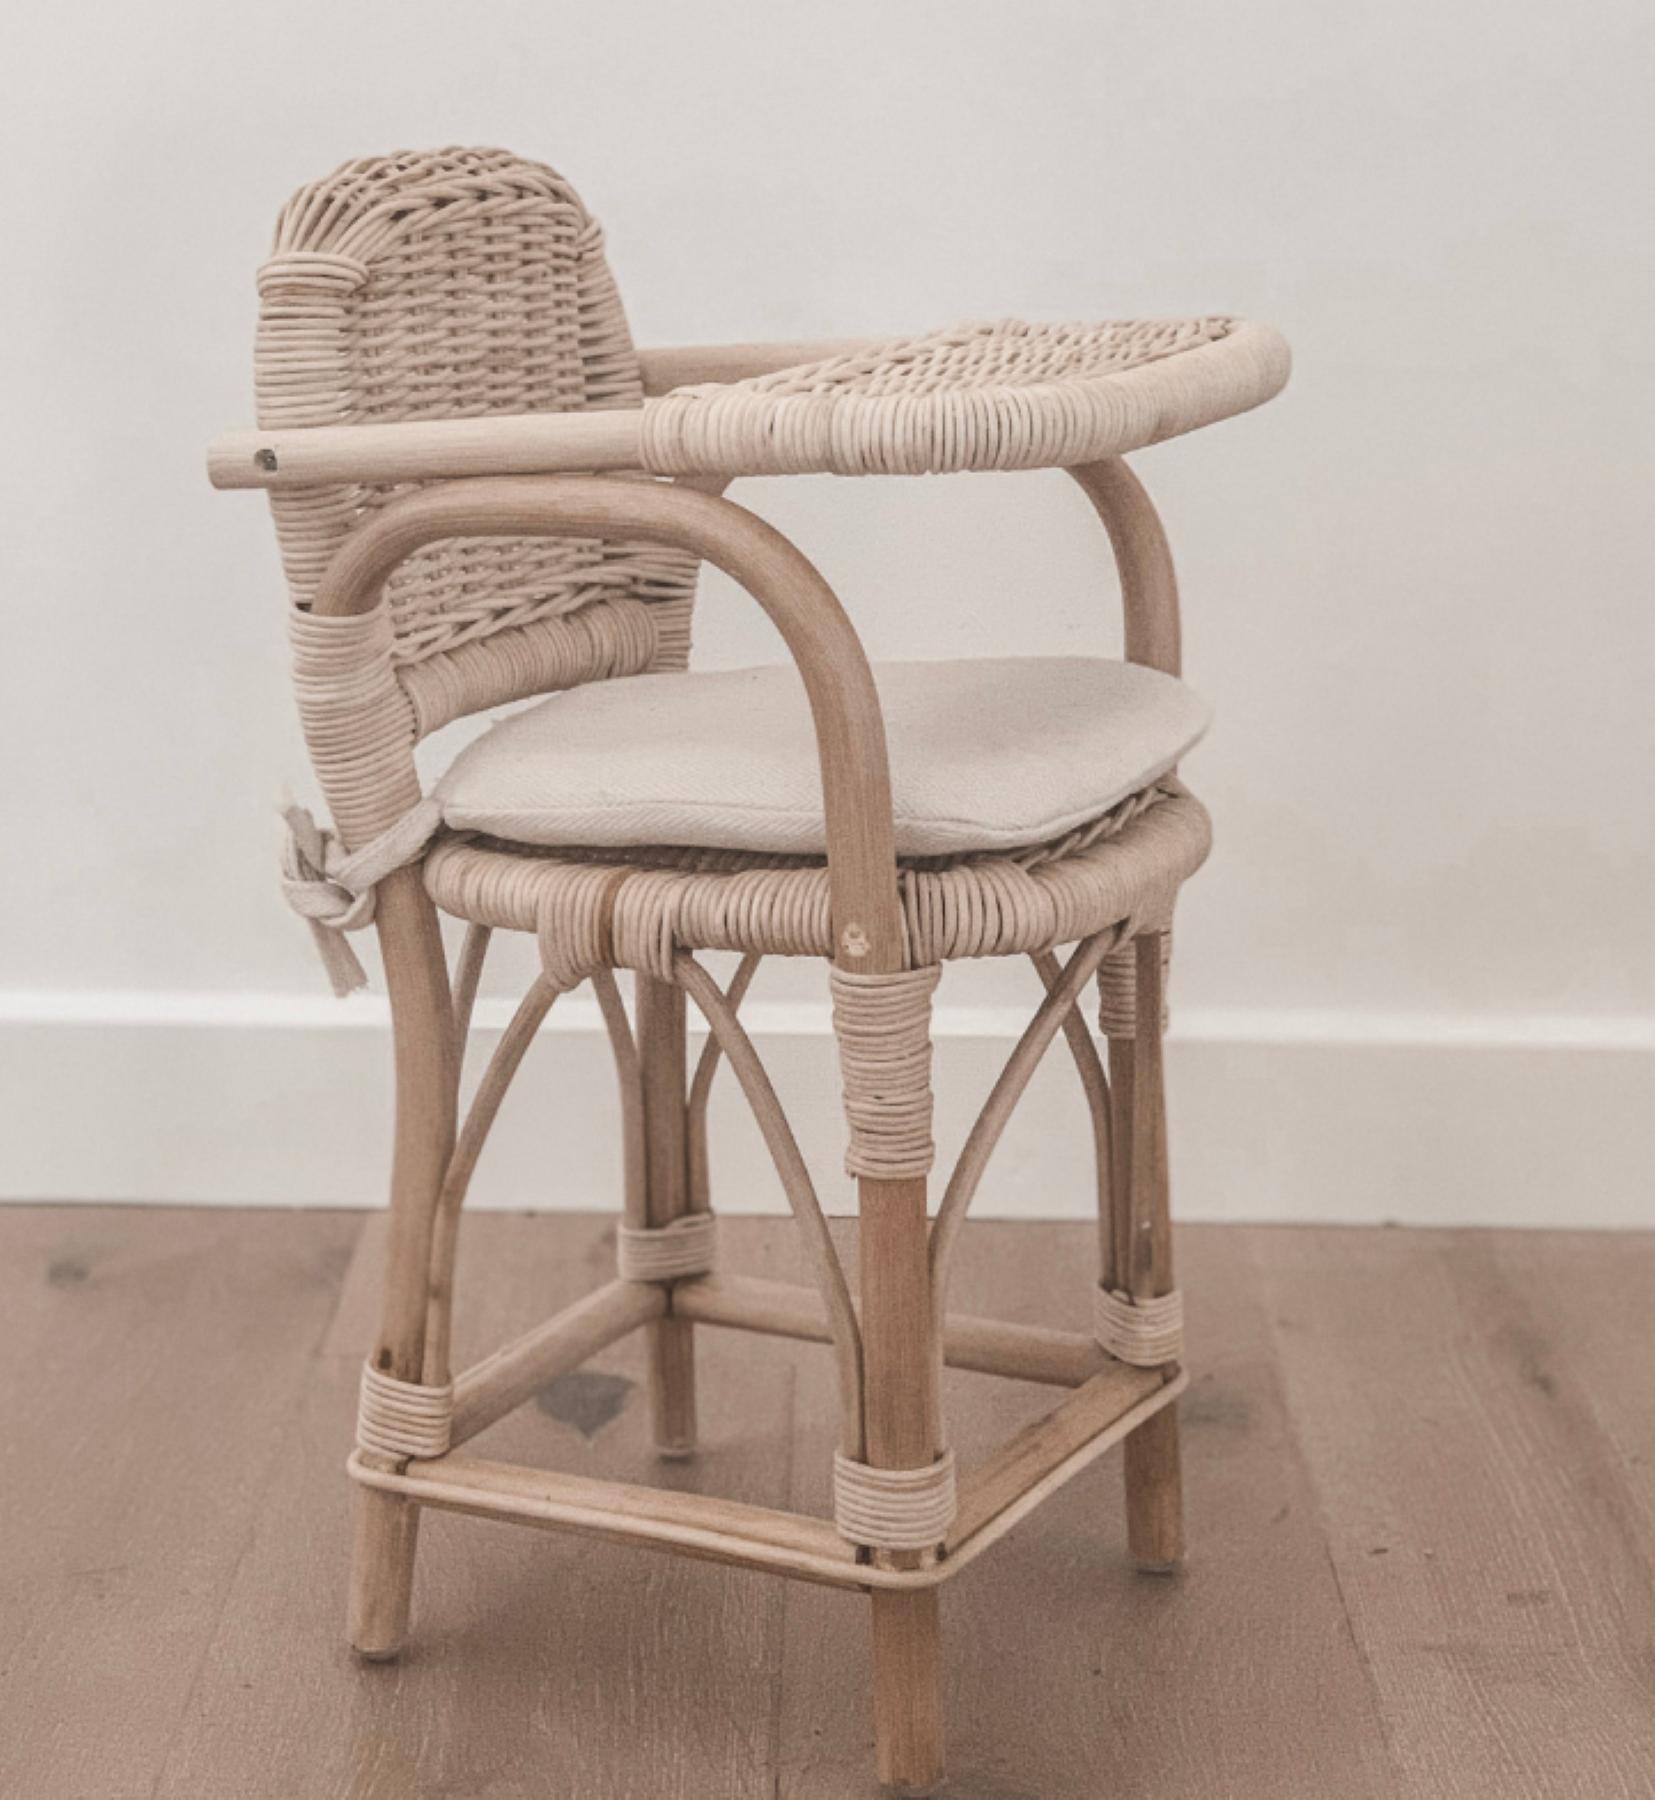 Tiny Harlow Dolls Rattan High Chair